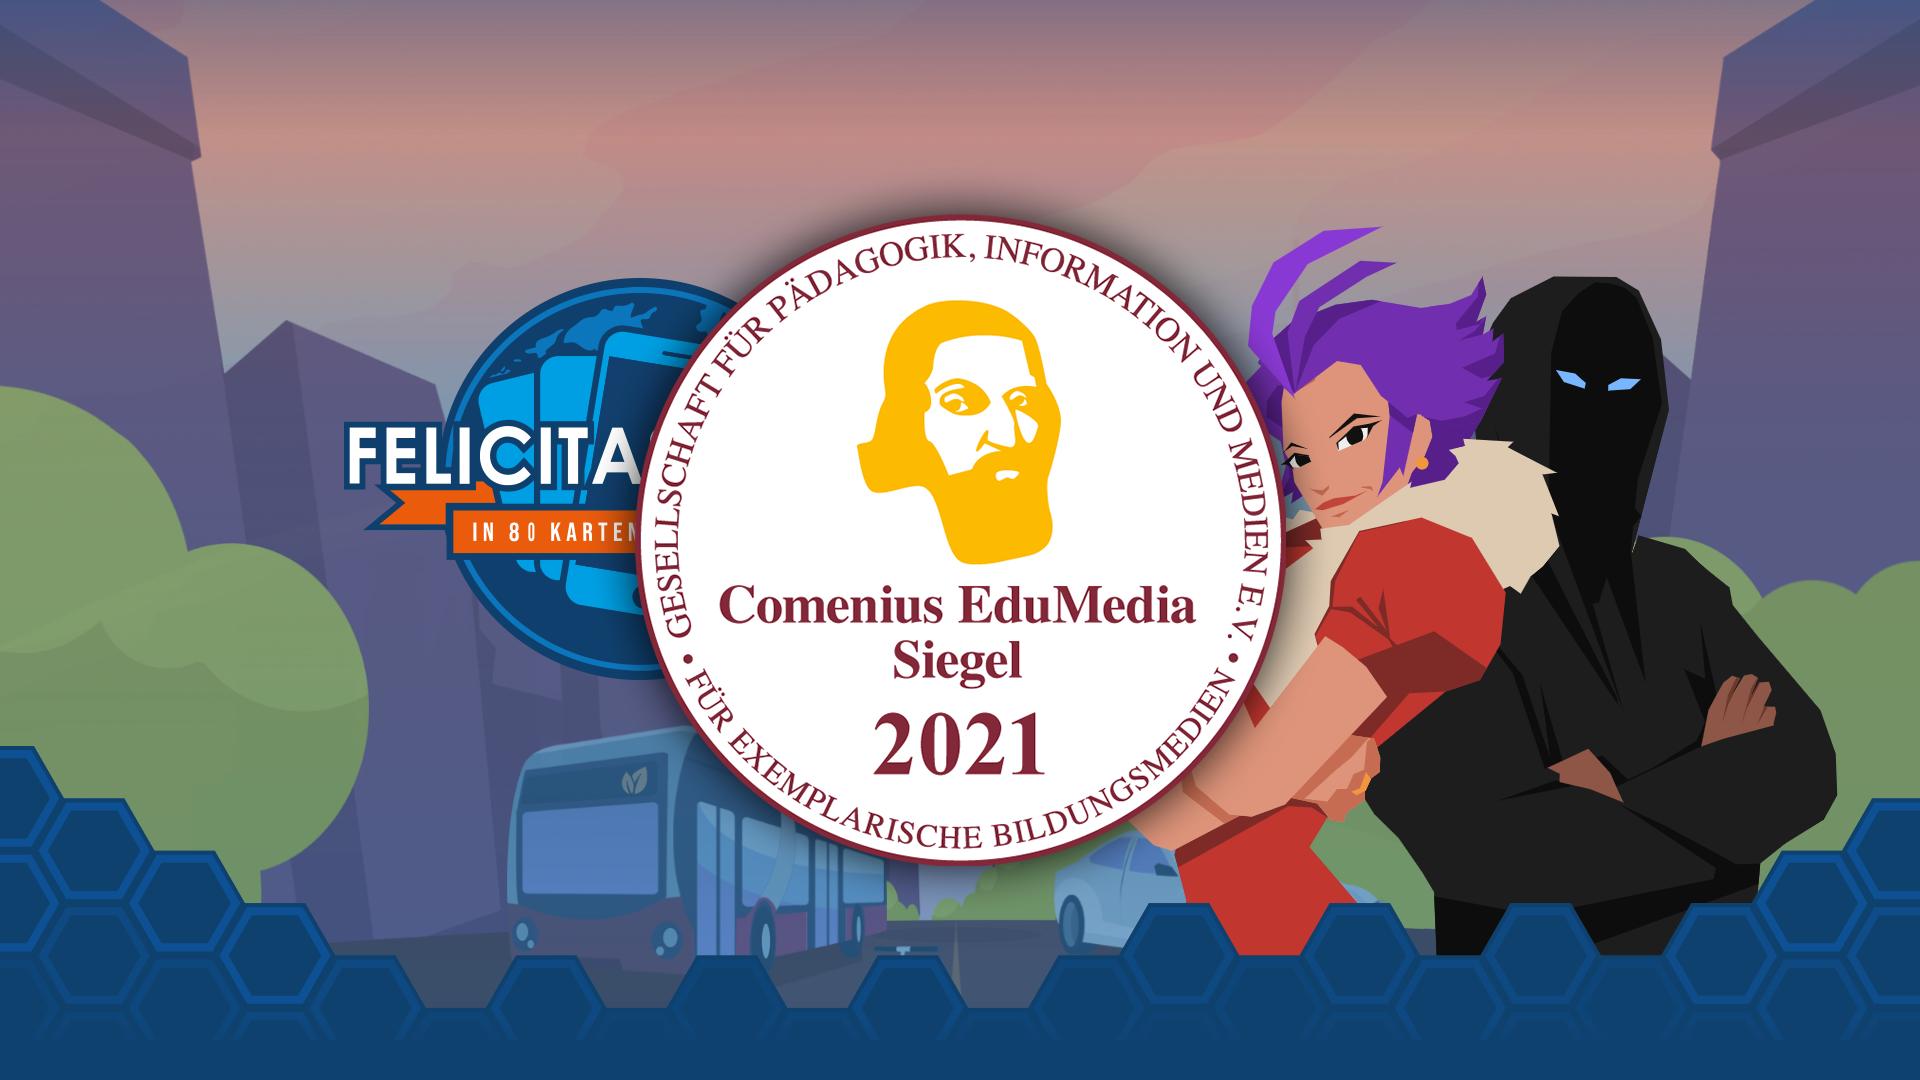 Felicitas Fogg Grafik mit EduMedia-Siegel